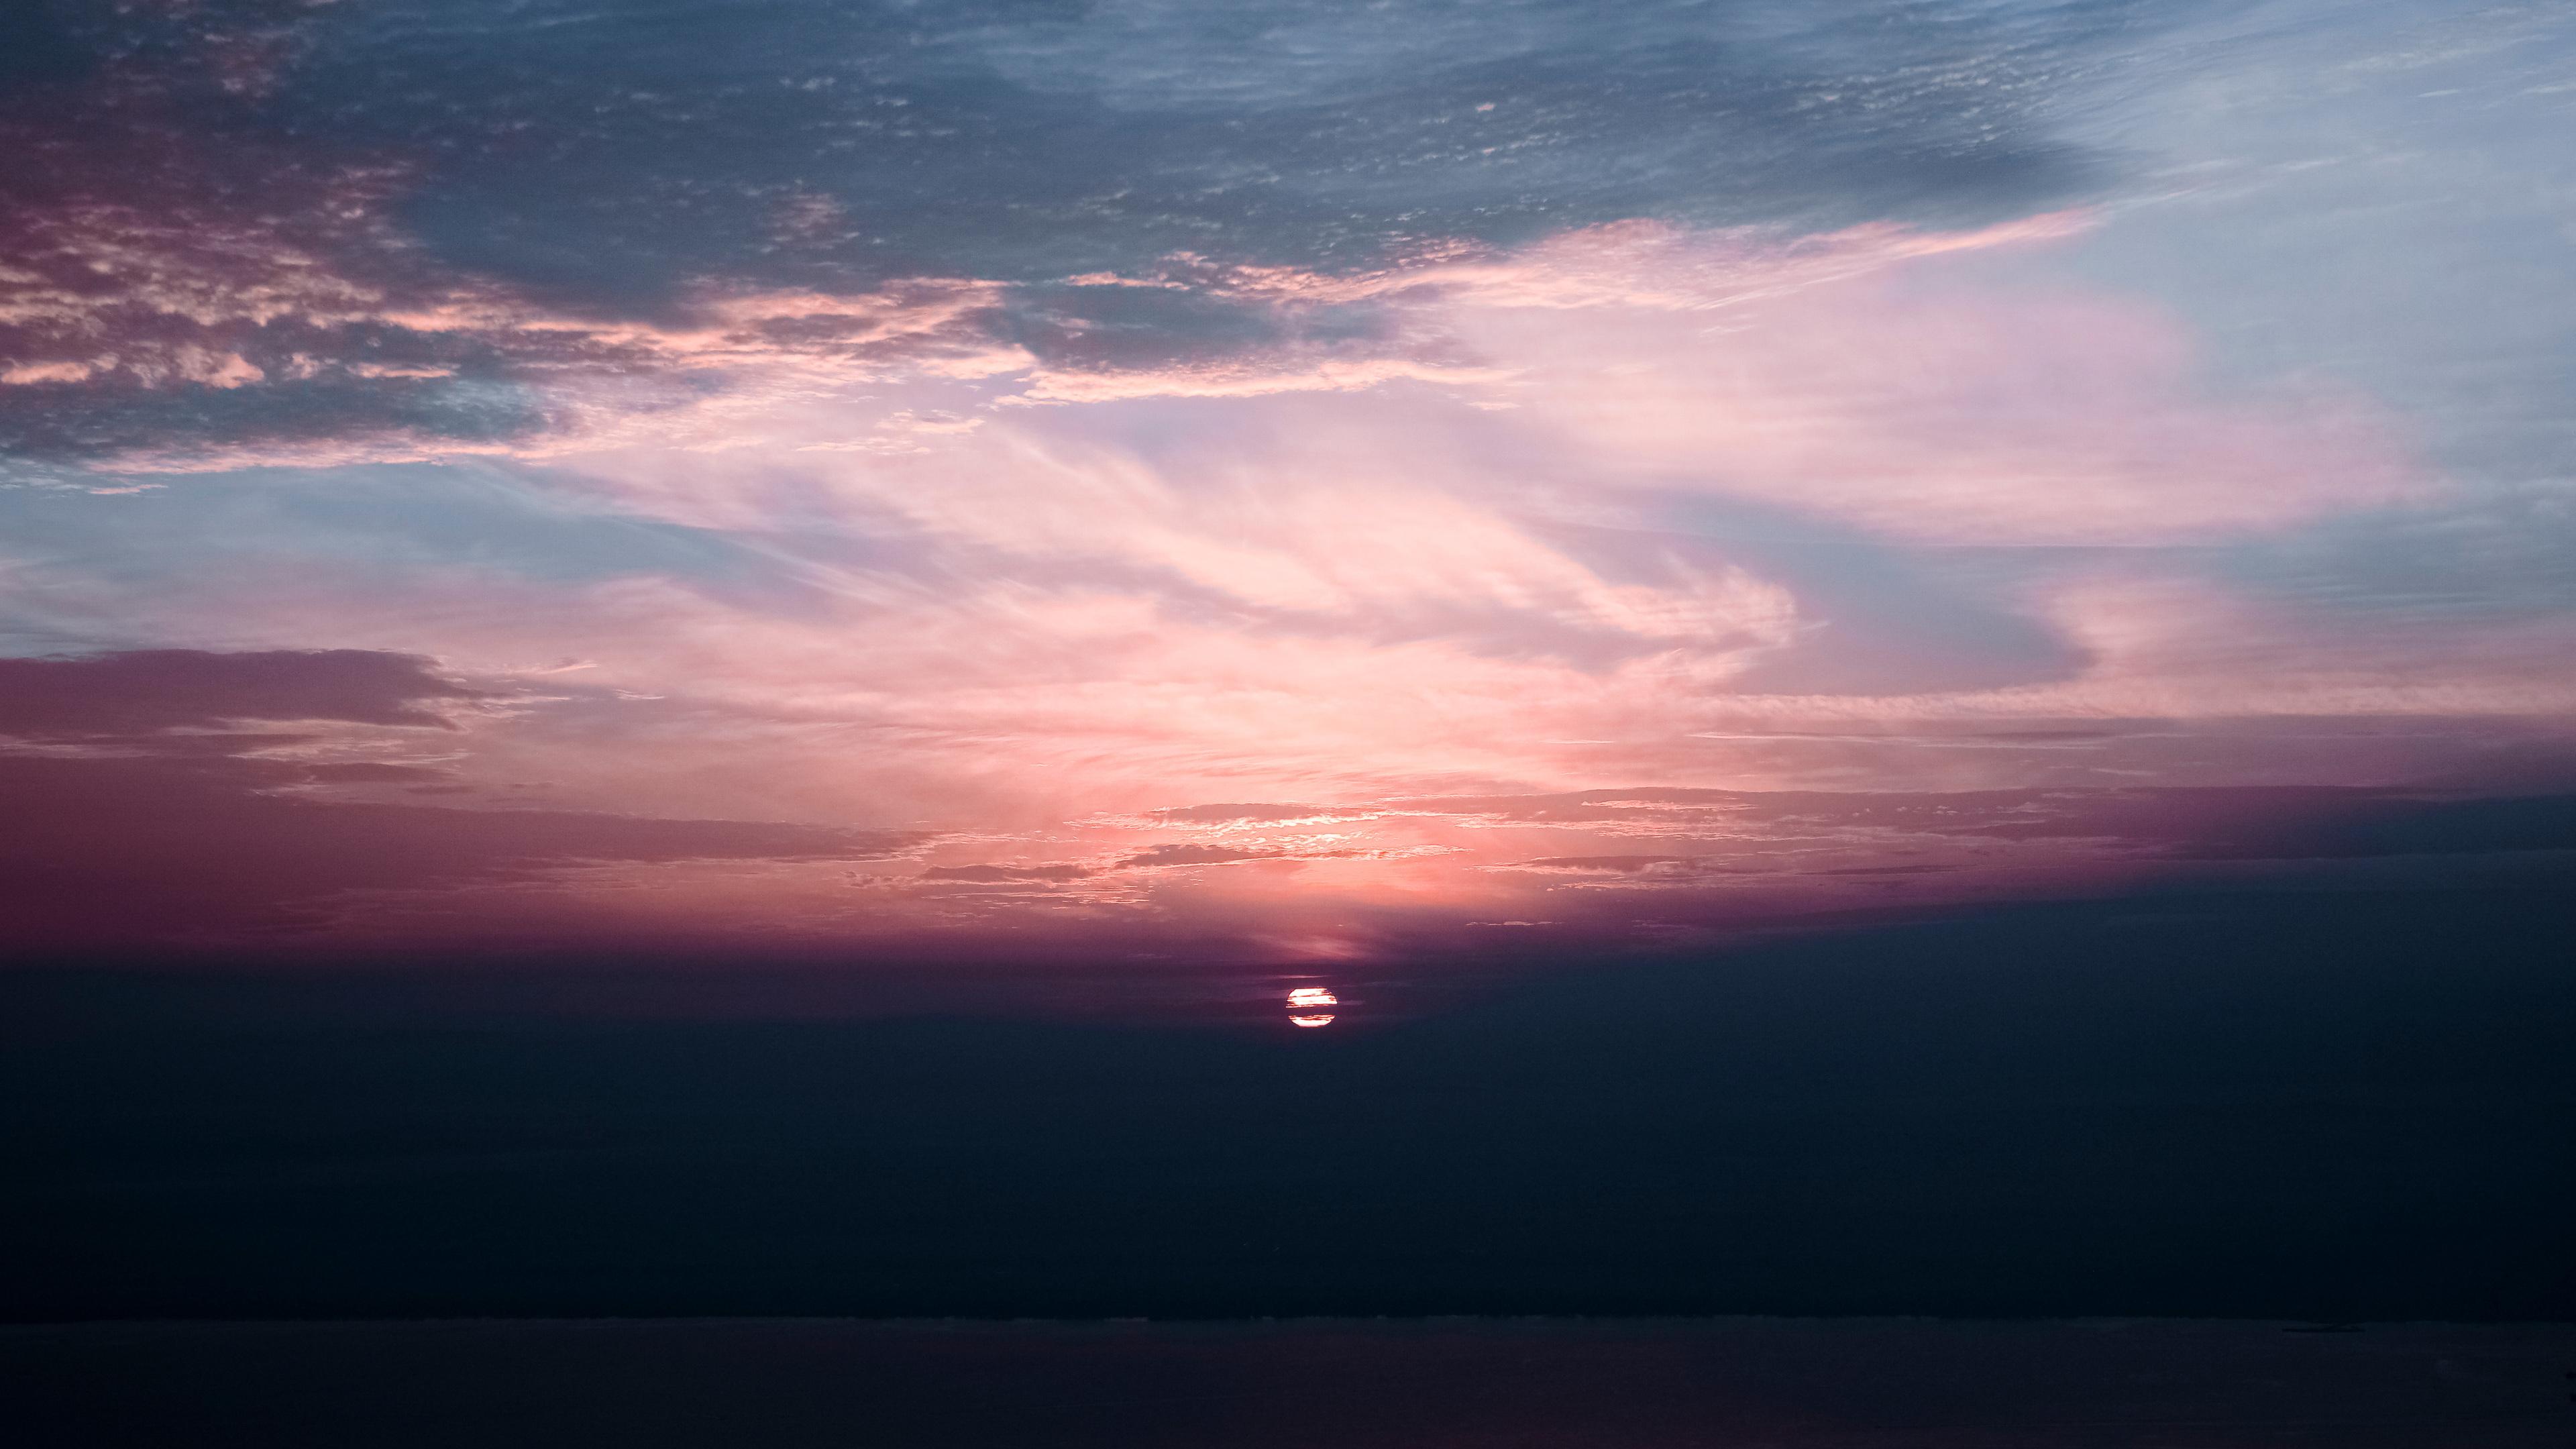 sunset under clouds sea 4k 1540136334 - Sunset Under Clouds Sea 4k - sunset wallpapers, sea wallpapers, nature wallpapers, hd-wallpapers, dusk wallpapers, dawn wallpapers, clouds wallpapers, 5k wallpapers, 4k-wallpapers